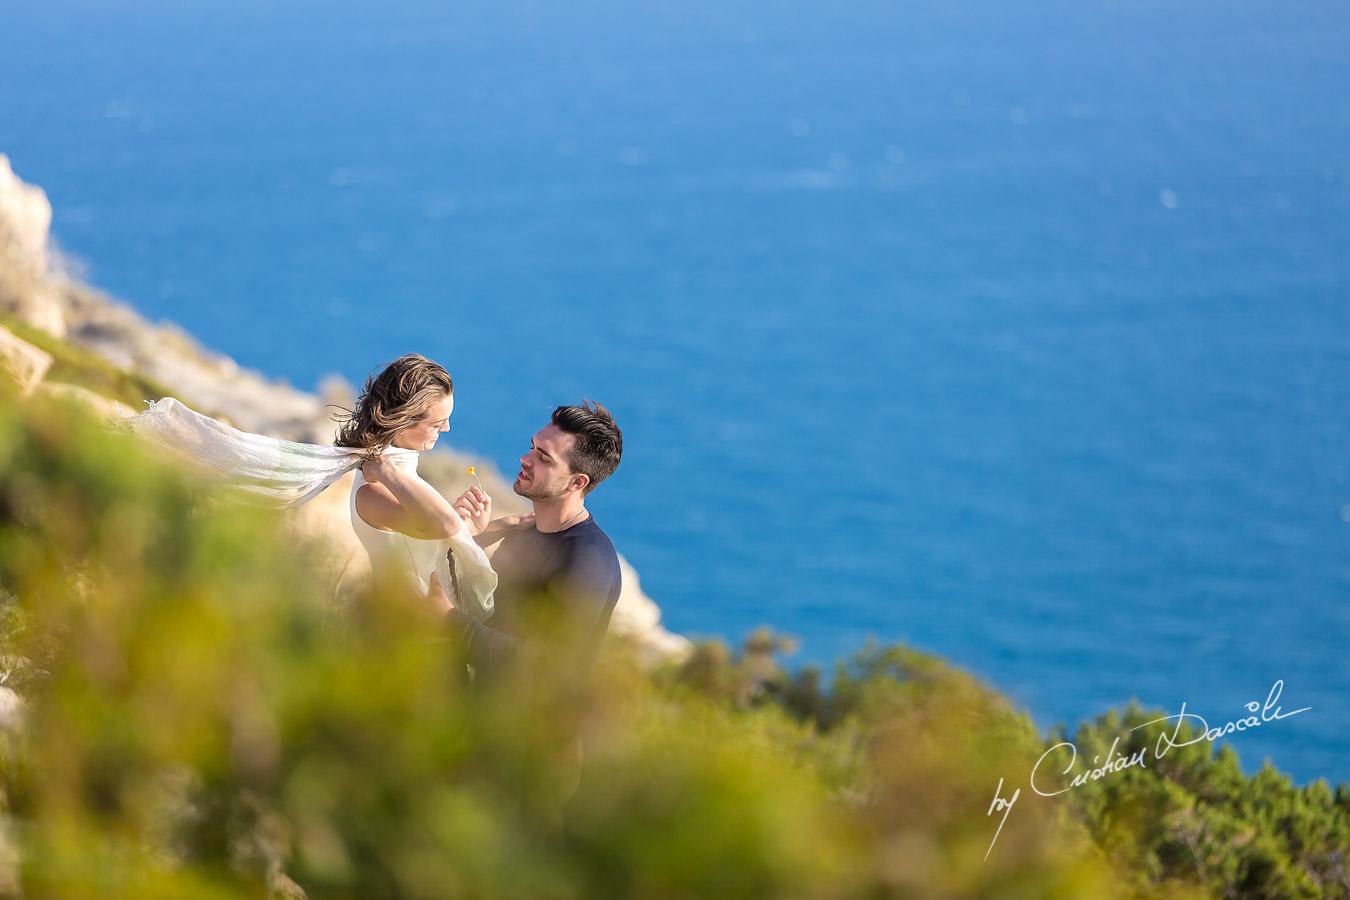 Love at first sight - Karen & Martins at Kurion Cyprus - 07